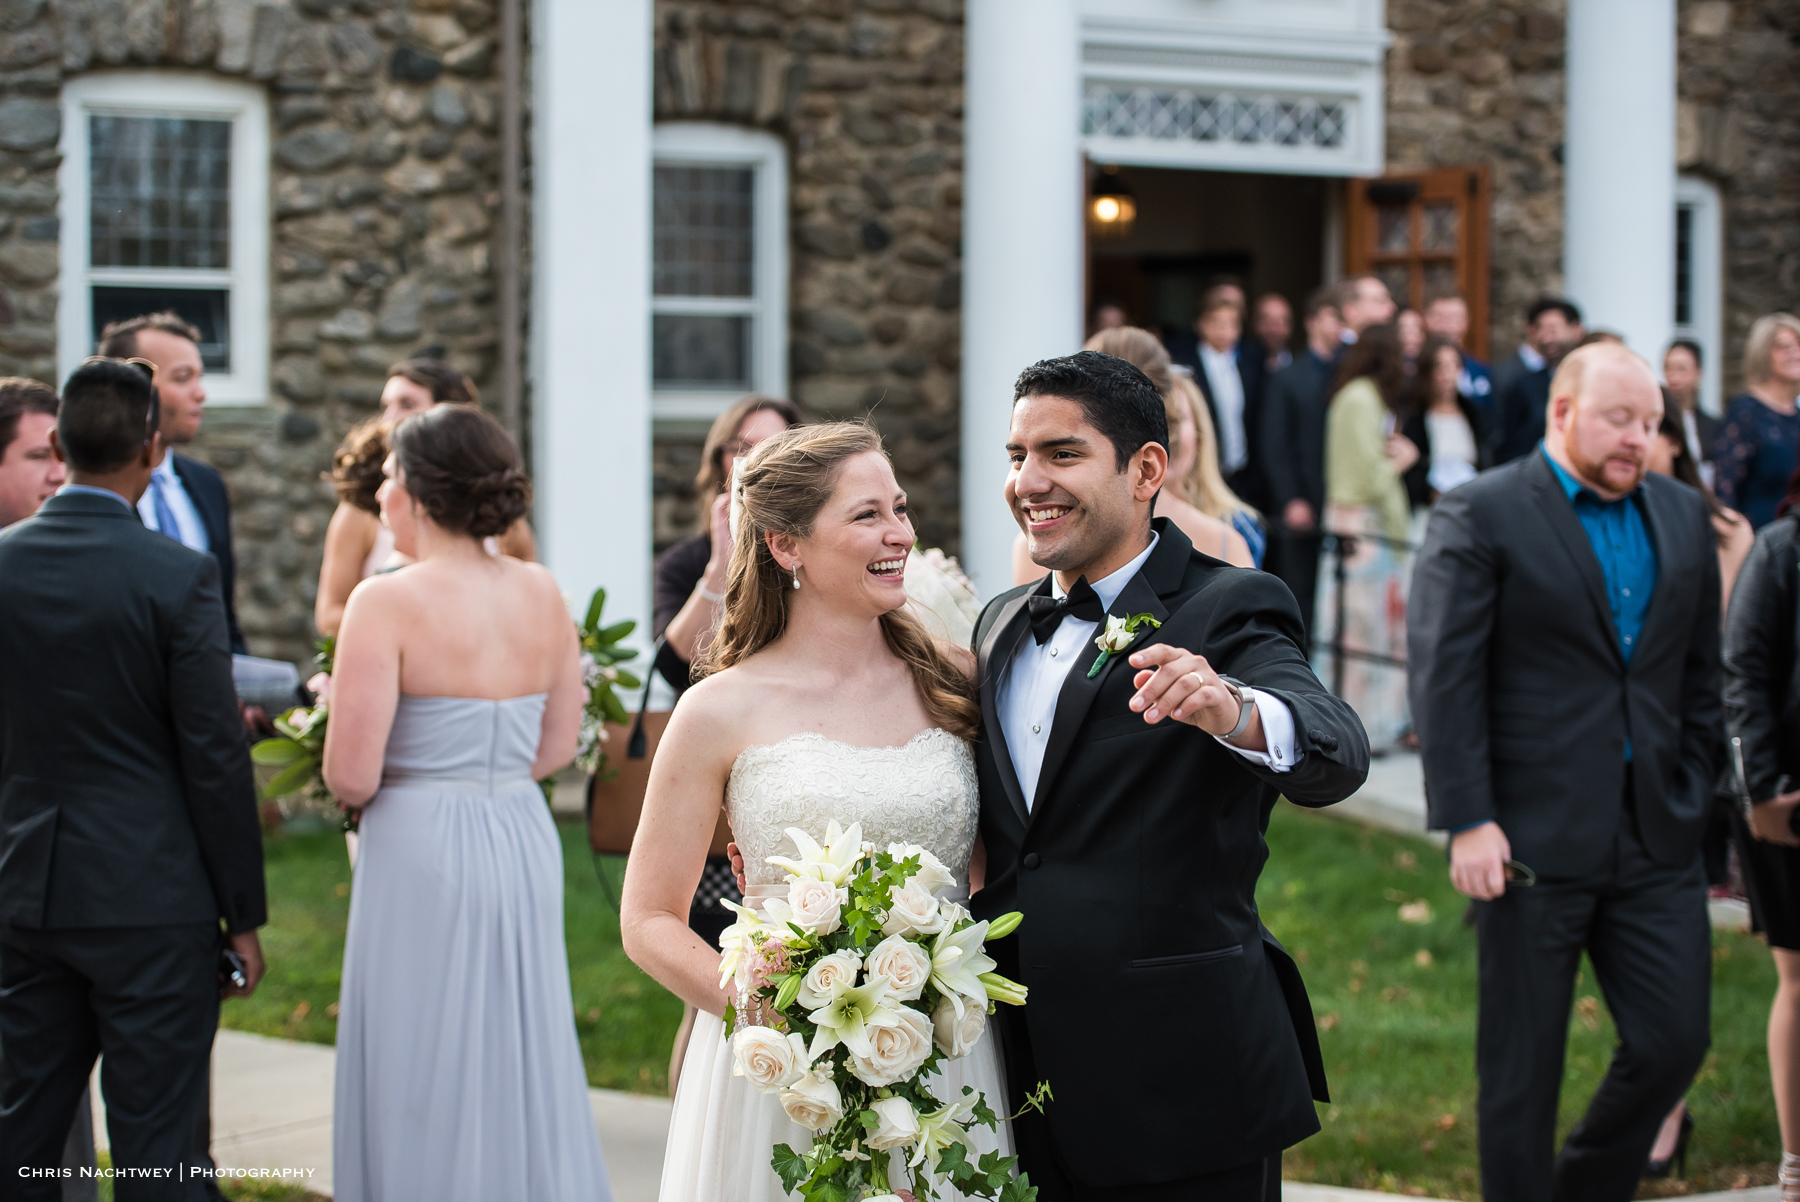 wedding-the-litchfield-inn-ct-photos-chris-nachtwey-photography-2018-34.jpg